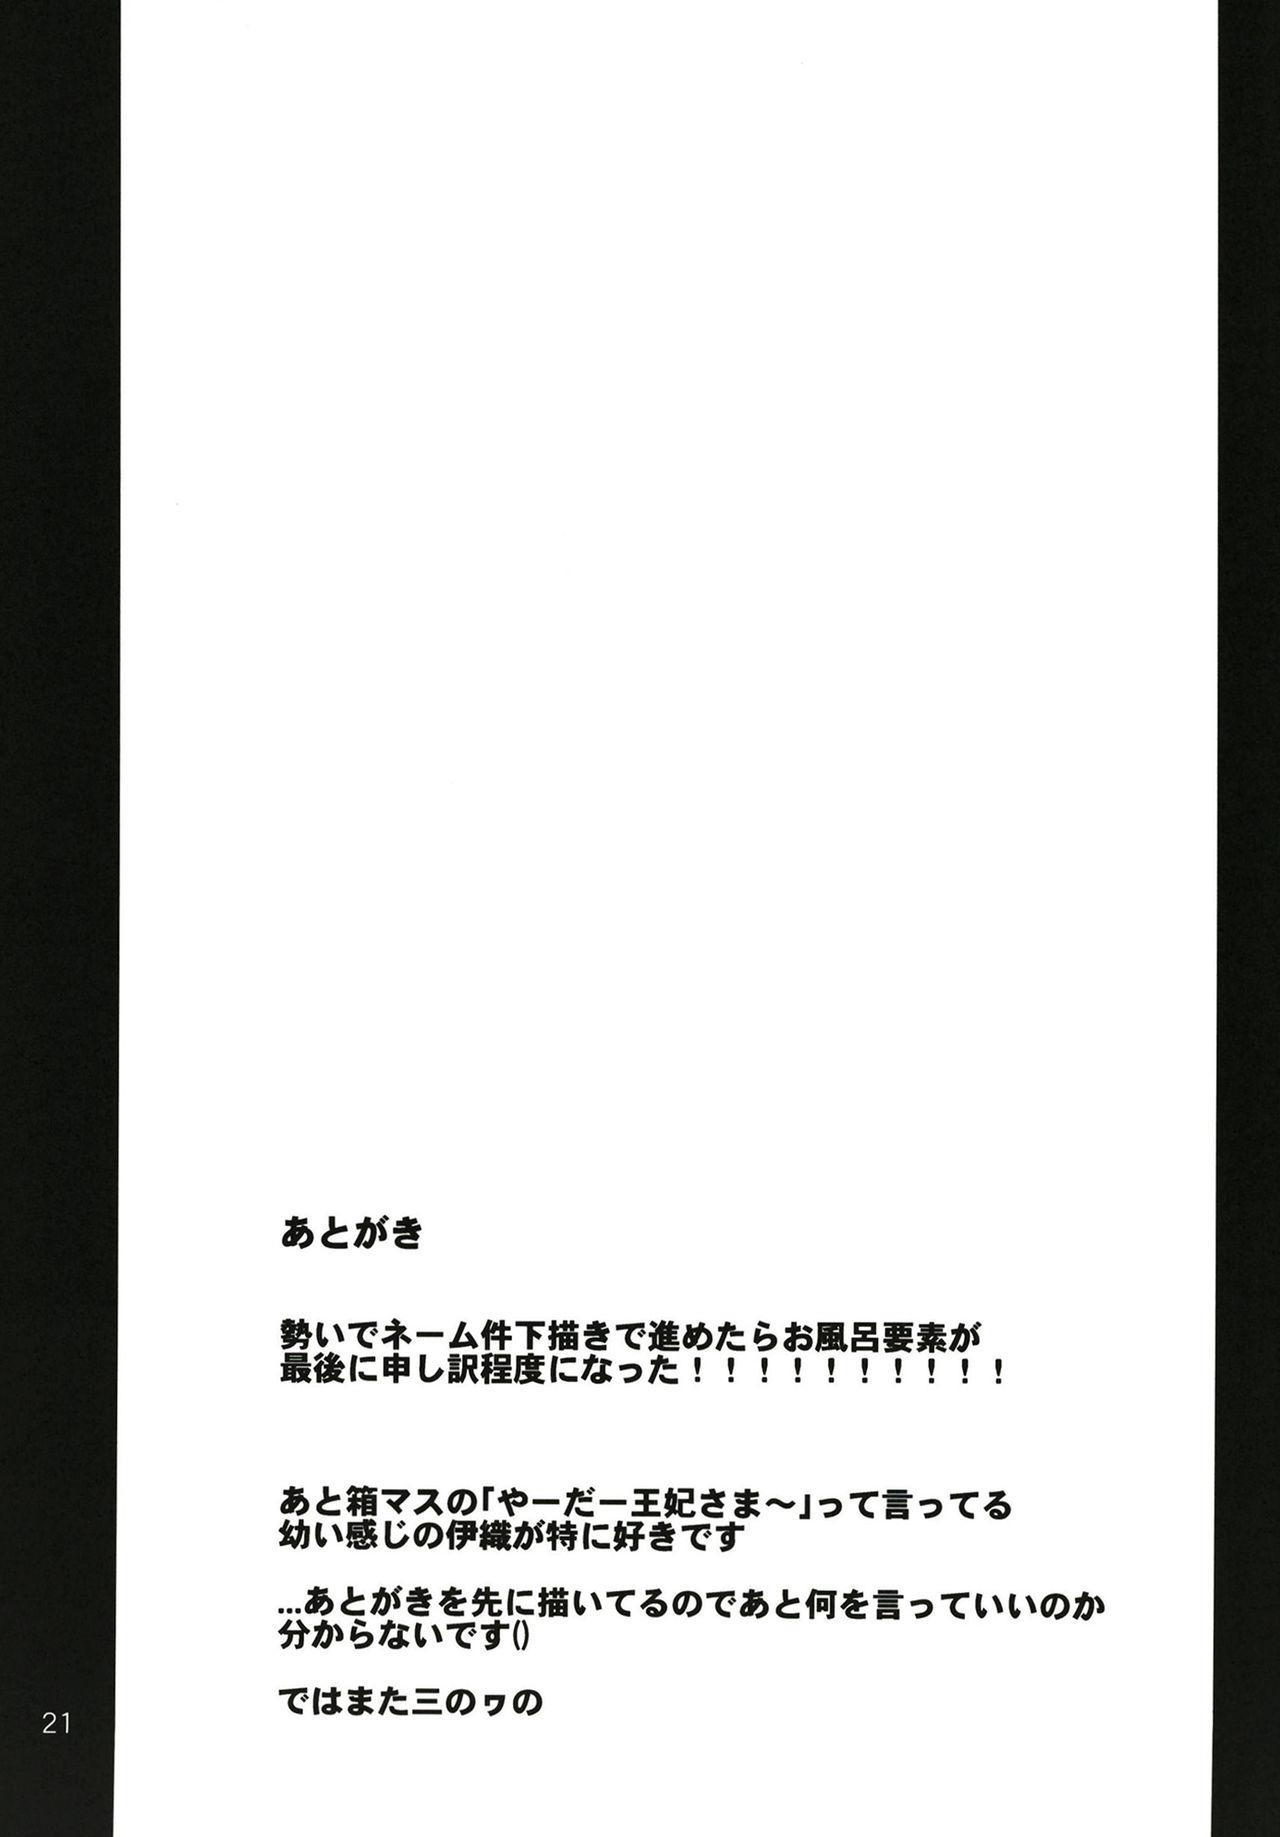 Iori to Ofuro. 21